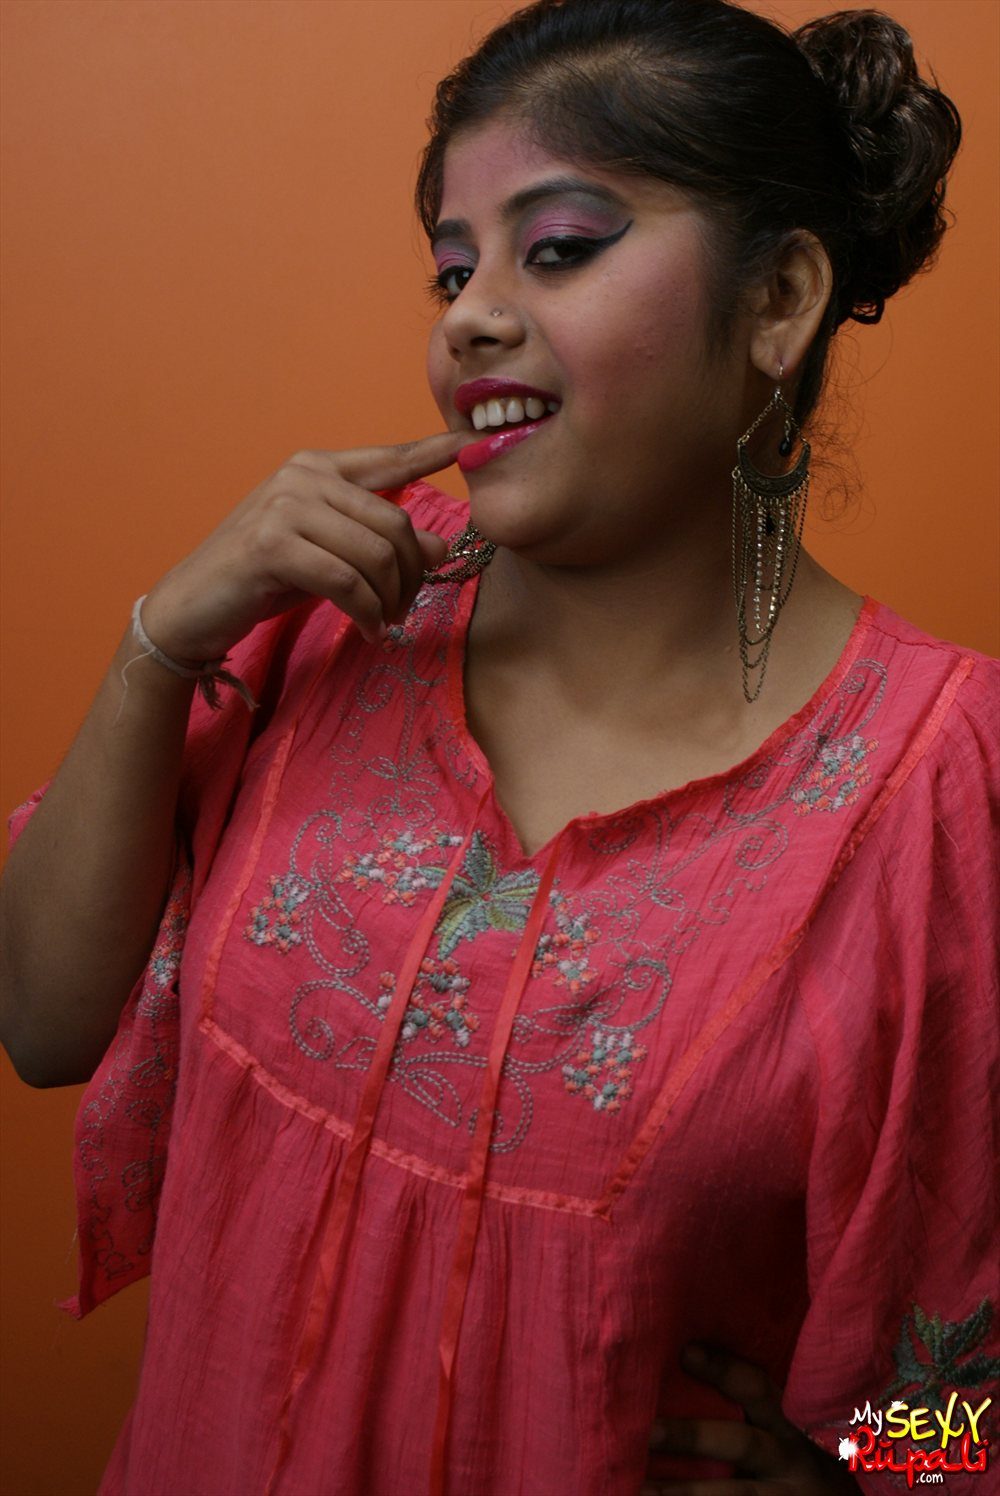 My Sexy Rupali Rupali Ek Hindustani Kuri In Traditional Indian